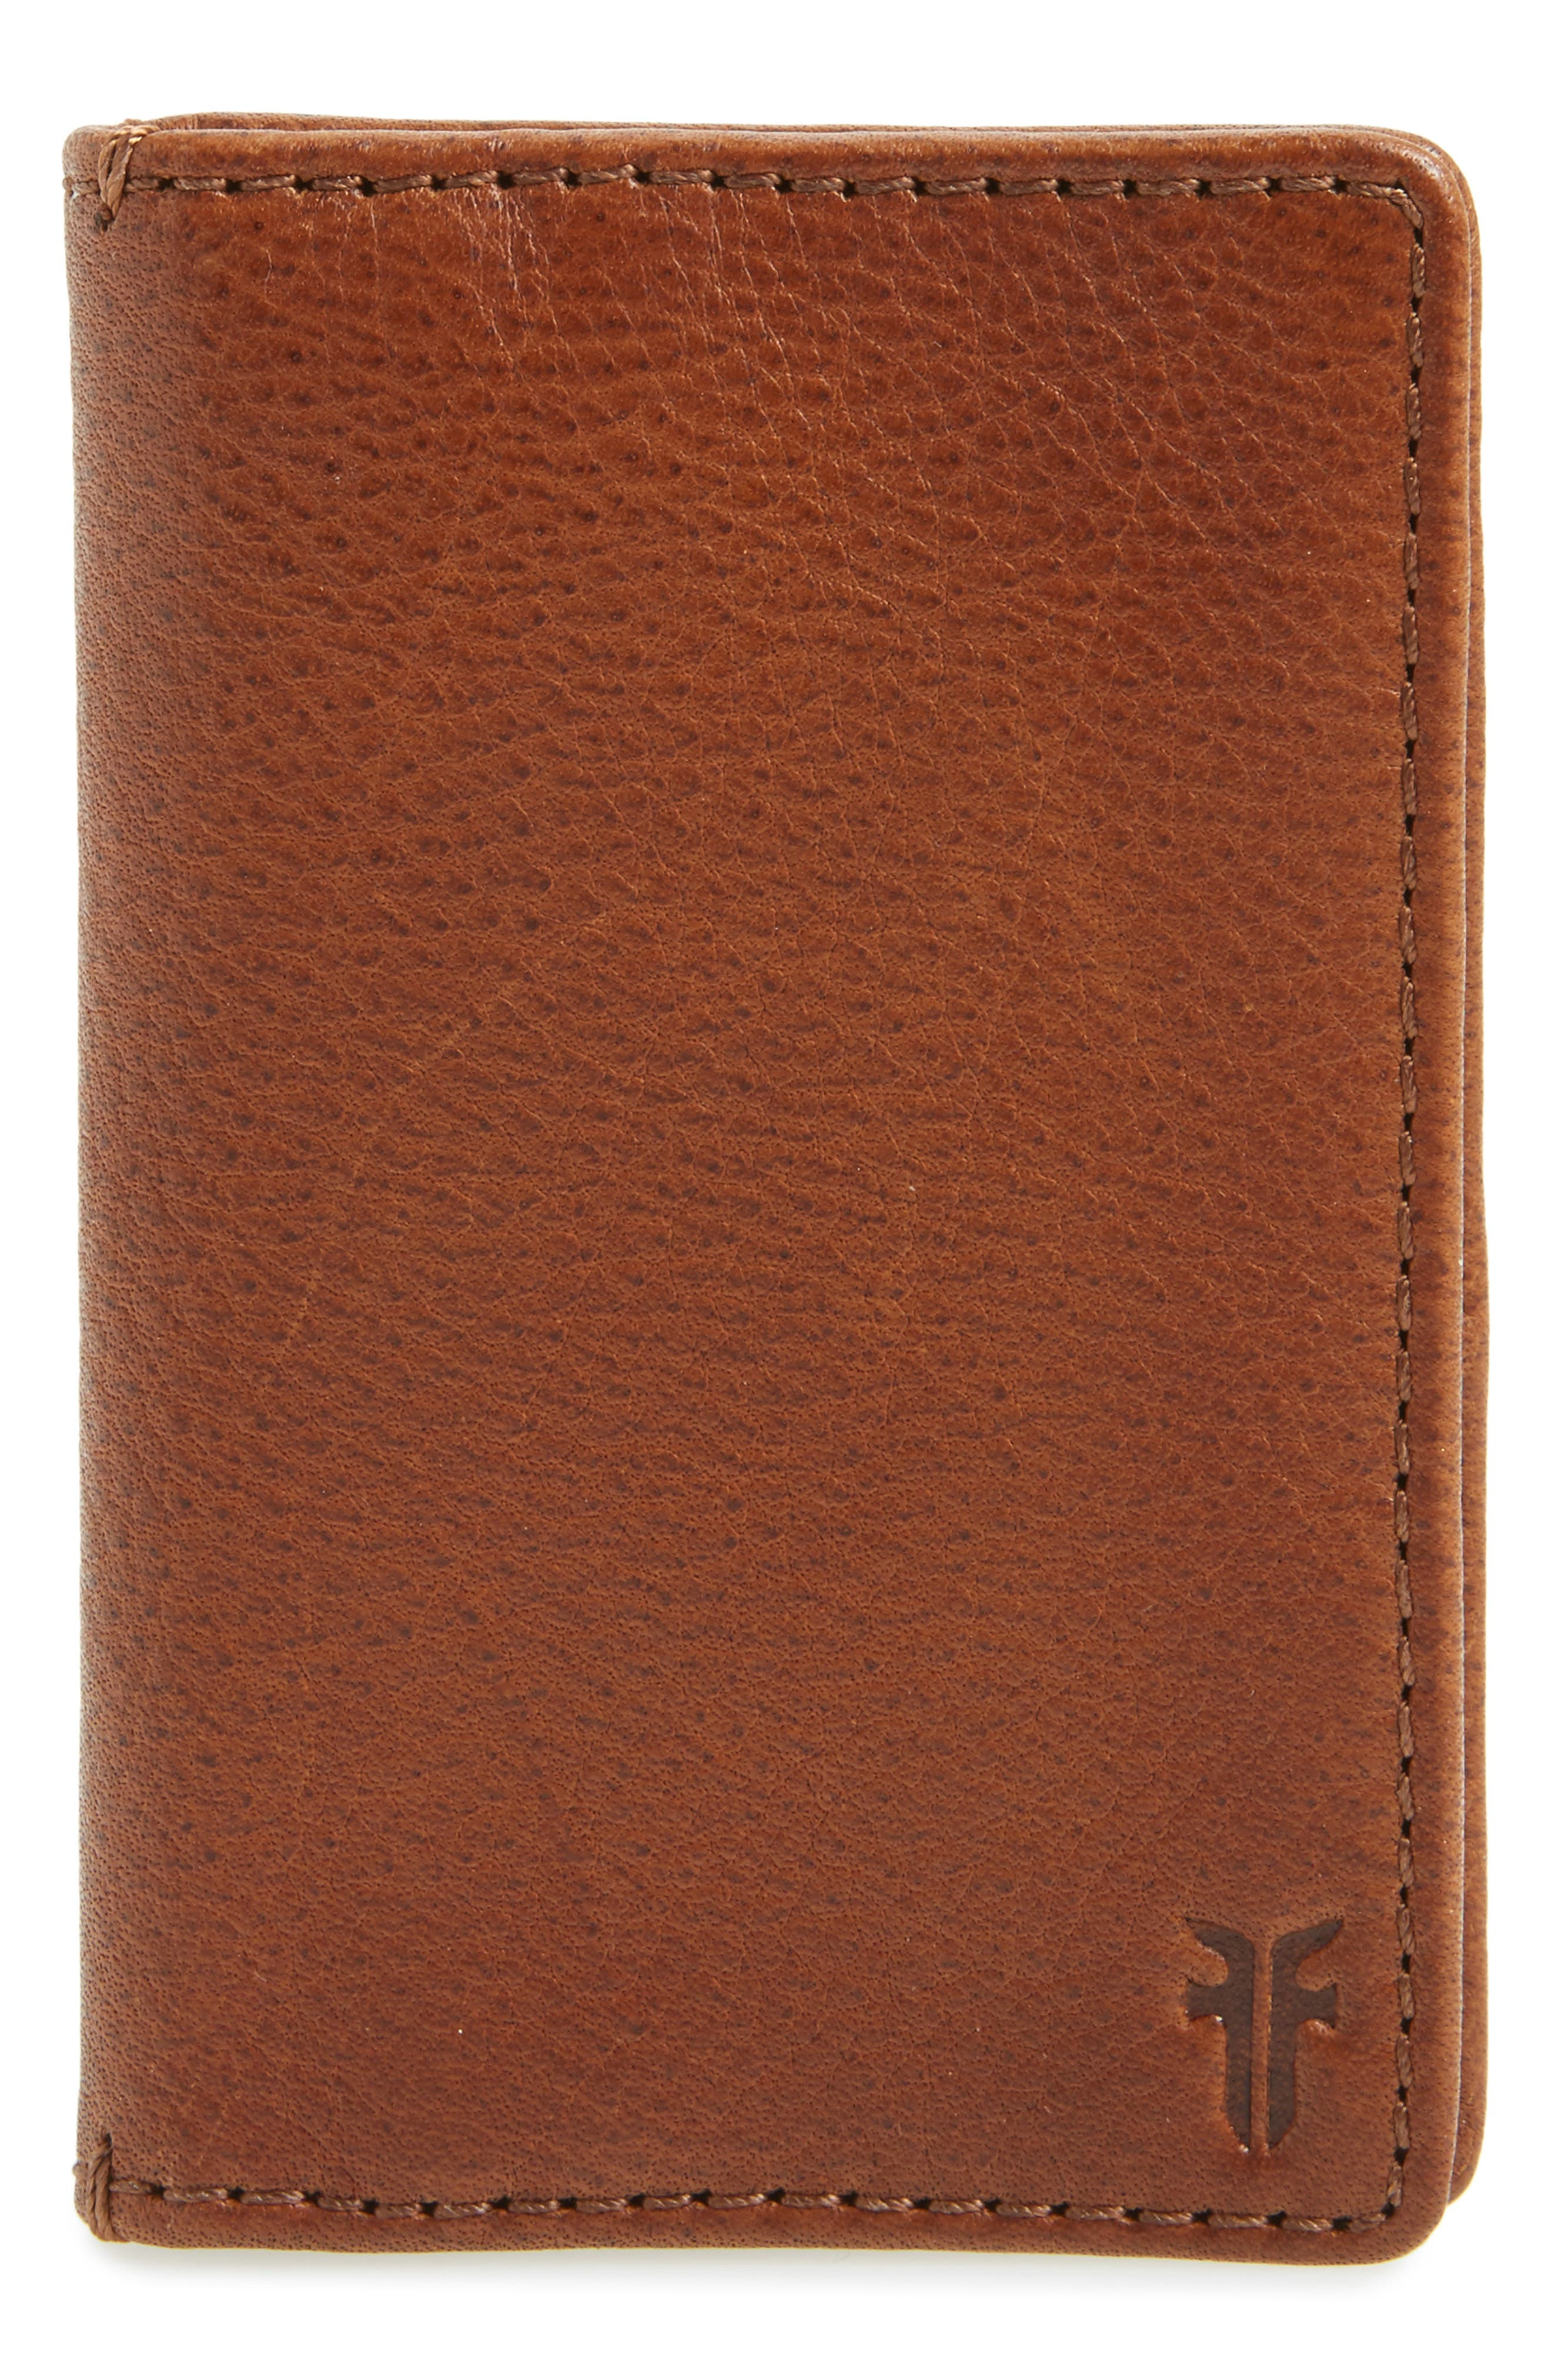 Oliver Leather Wallet,                         Main,                         color, COGNAC